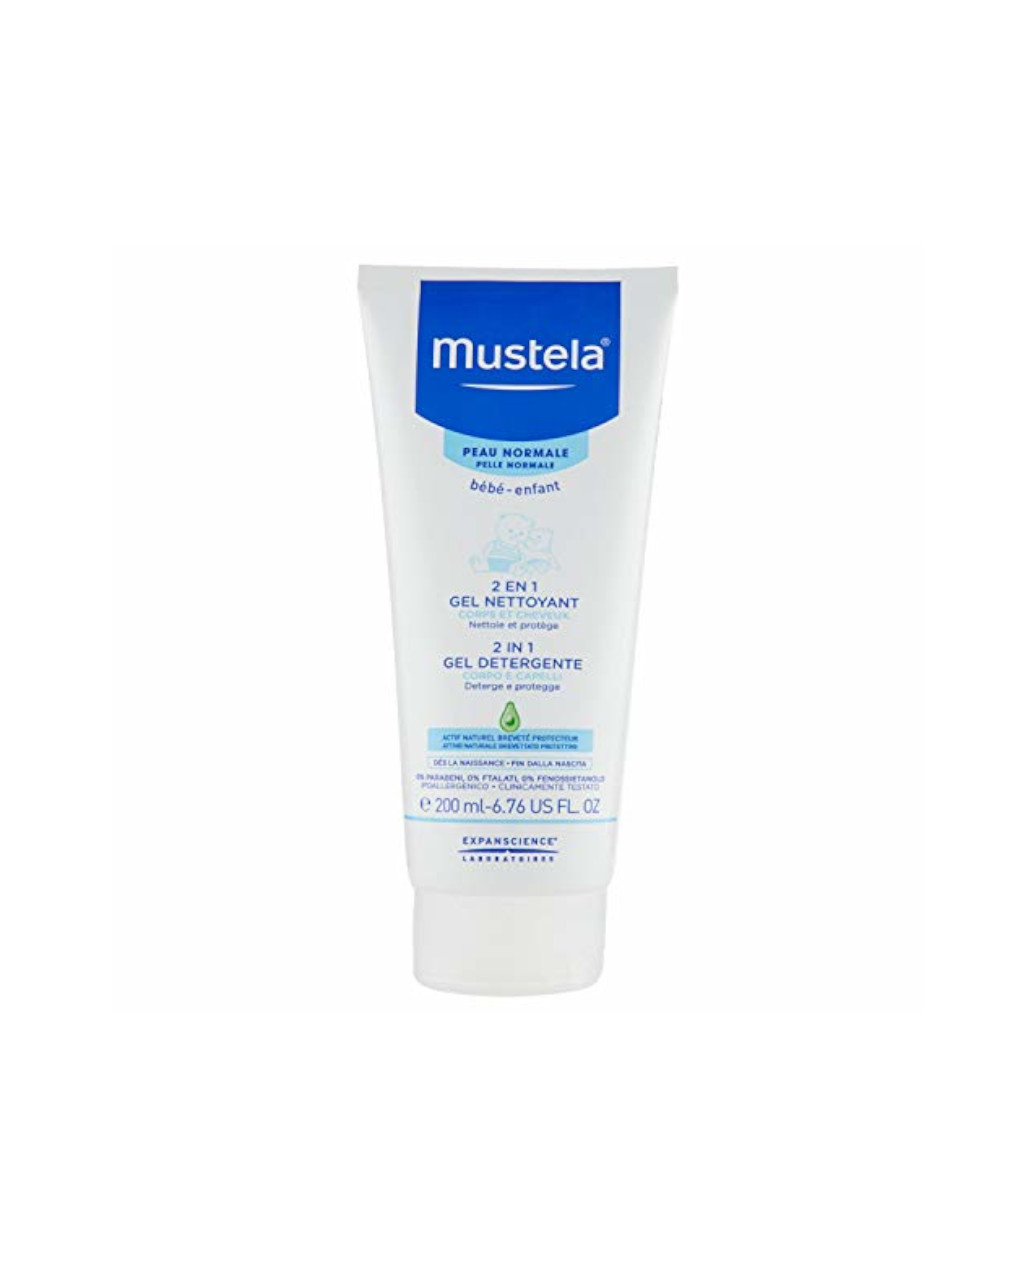 2in1 gel detergente delicato 200ml - Mustela